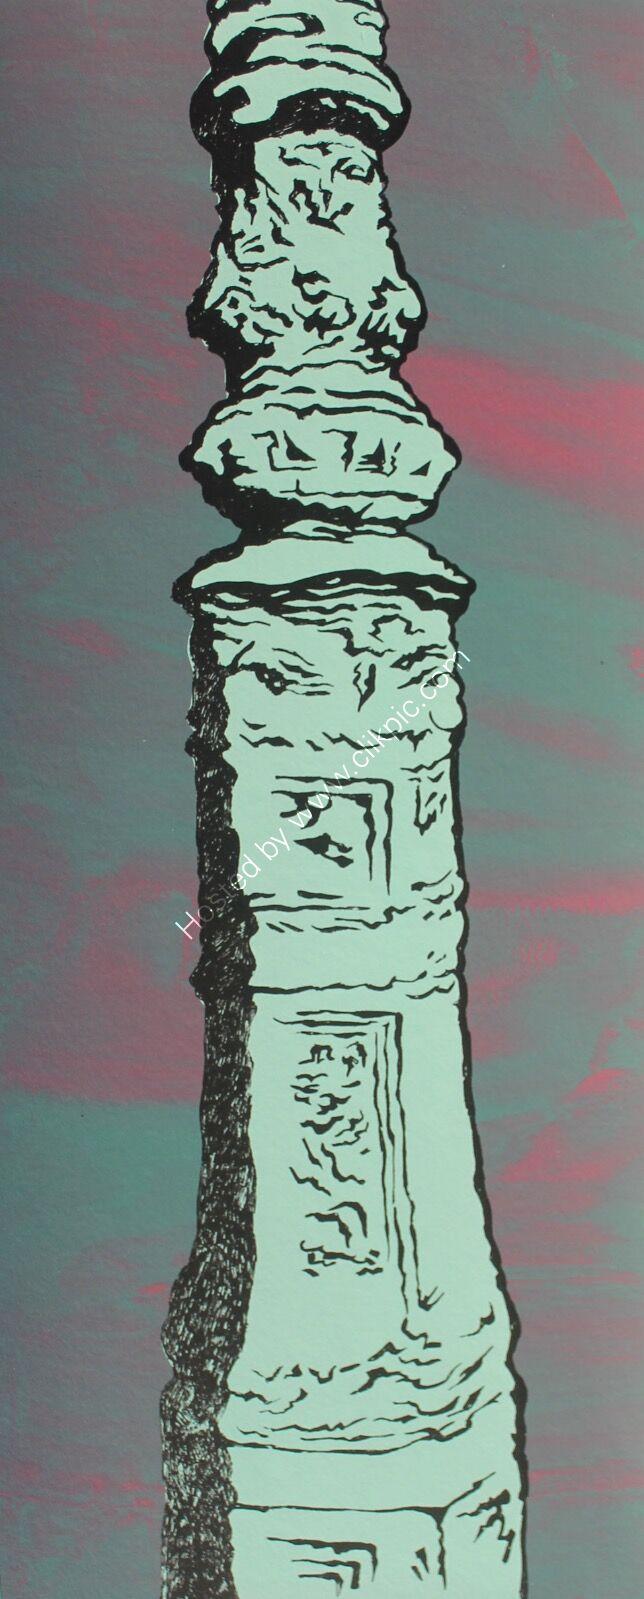 Brighton Lamppost / Green series Mixed 2